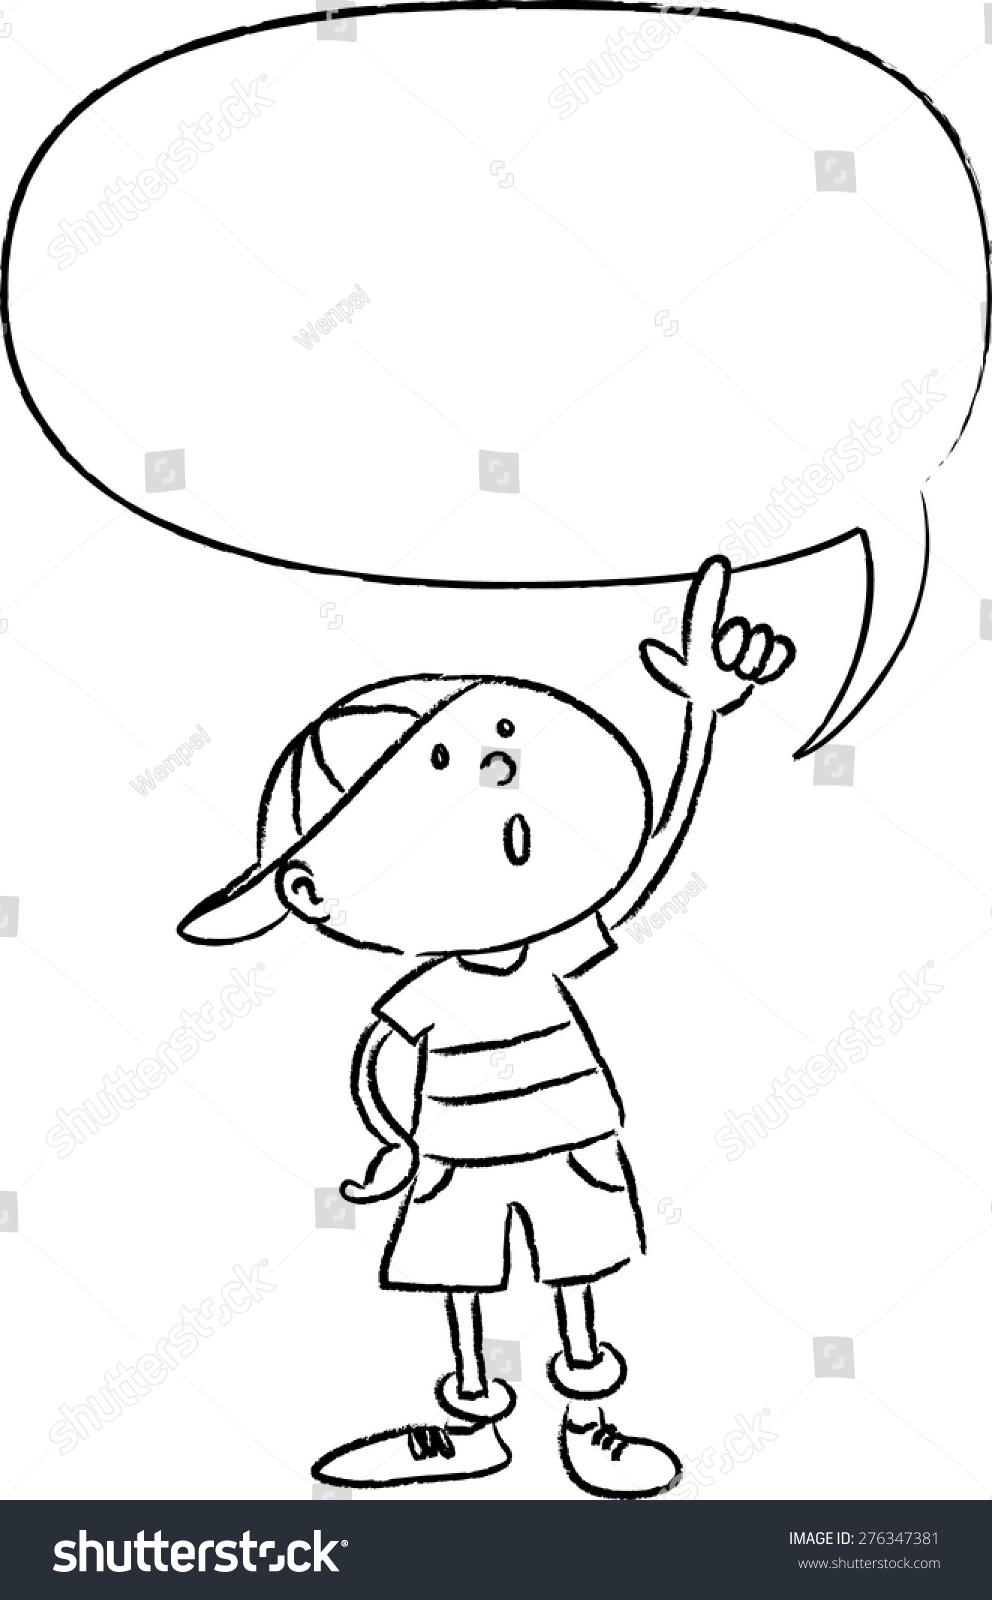 kid talking blank speech bubble stock vector (royalty free